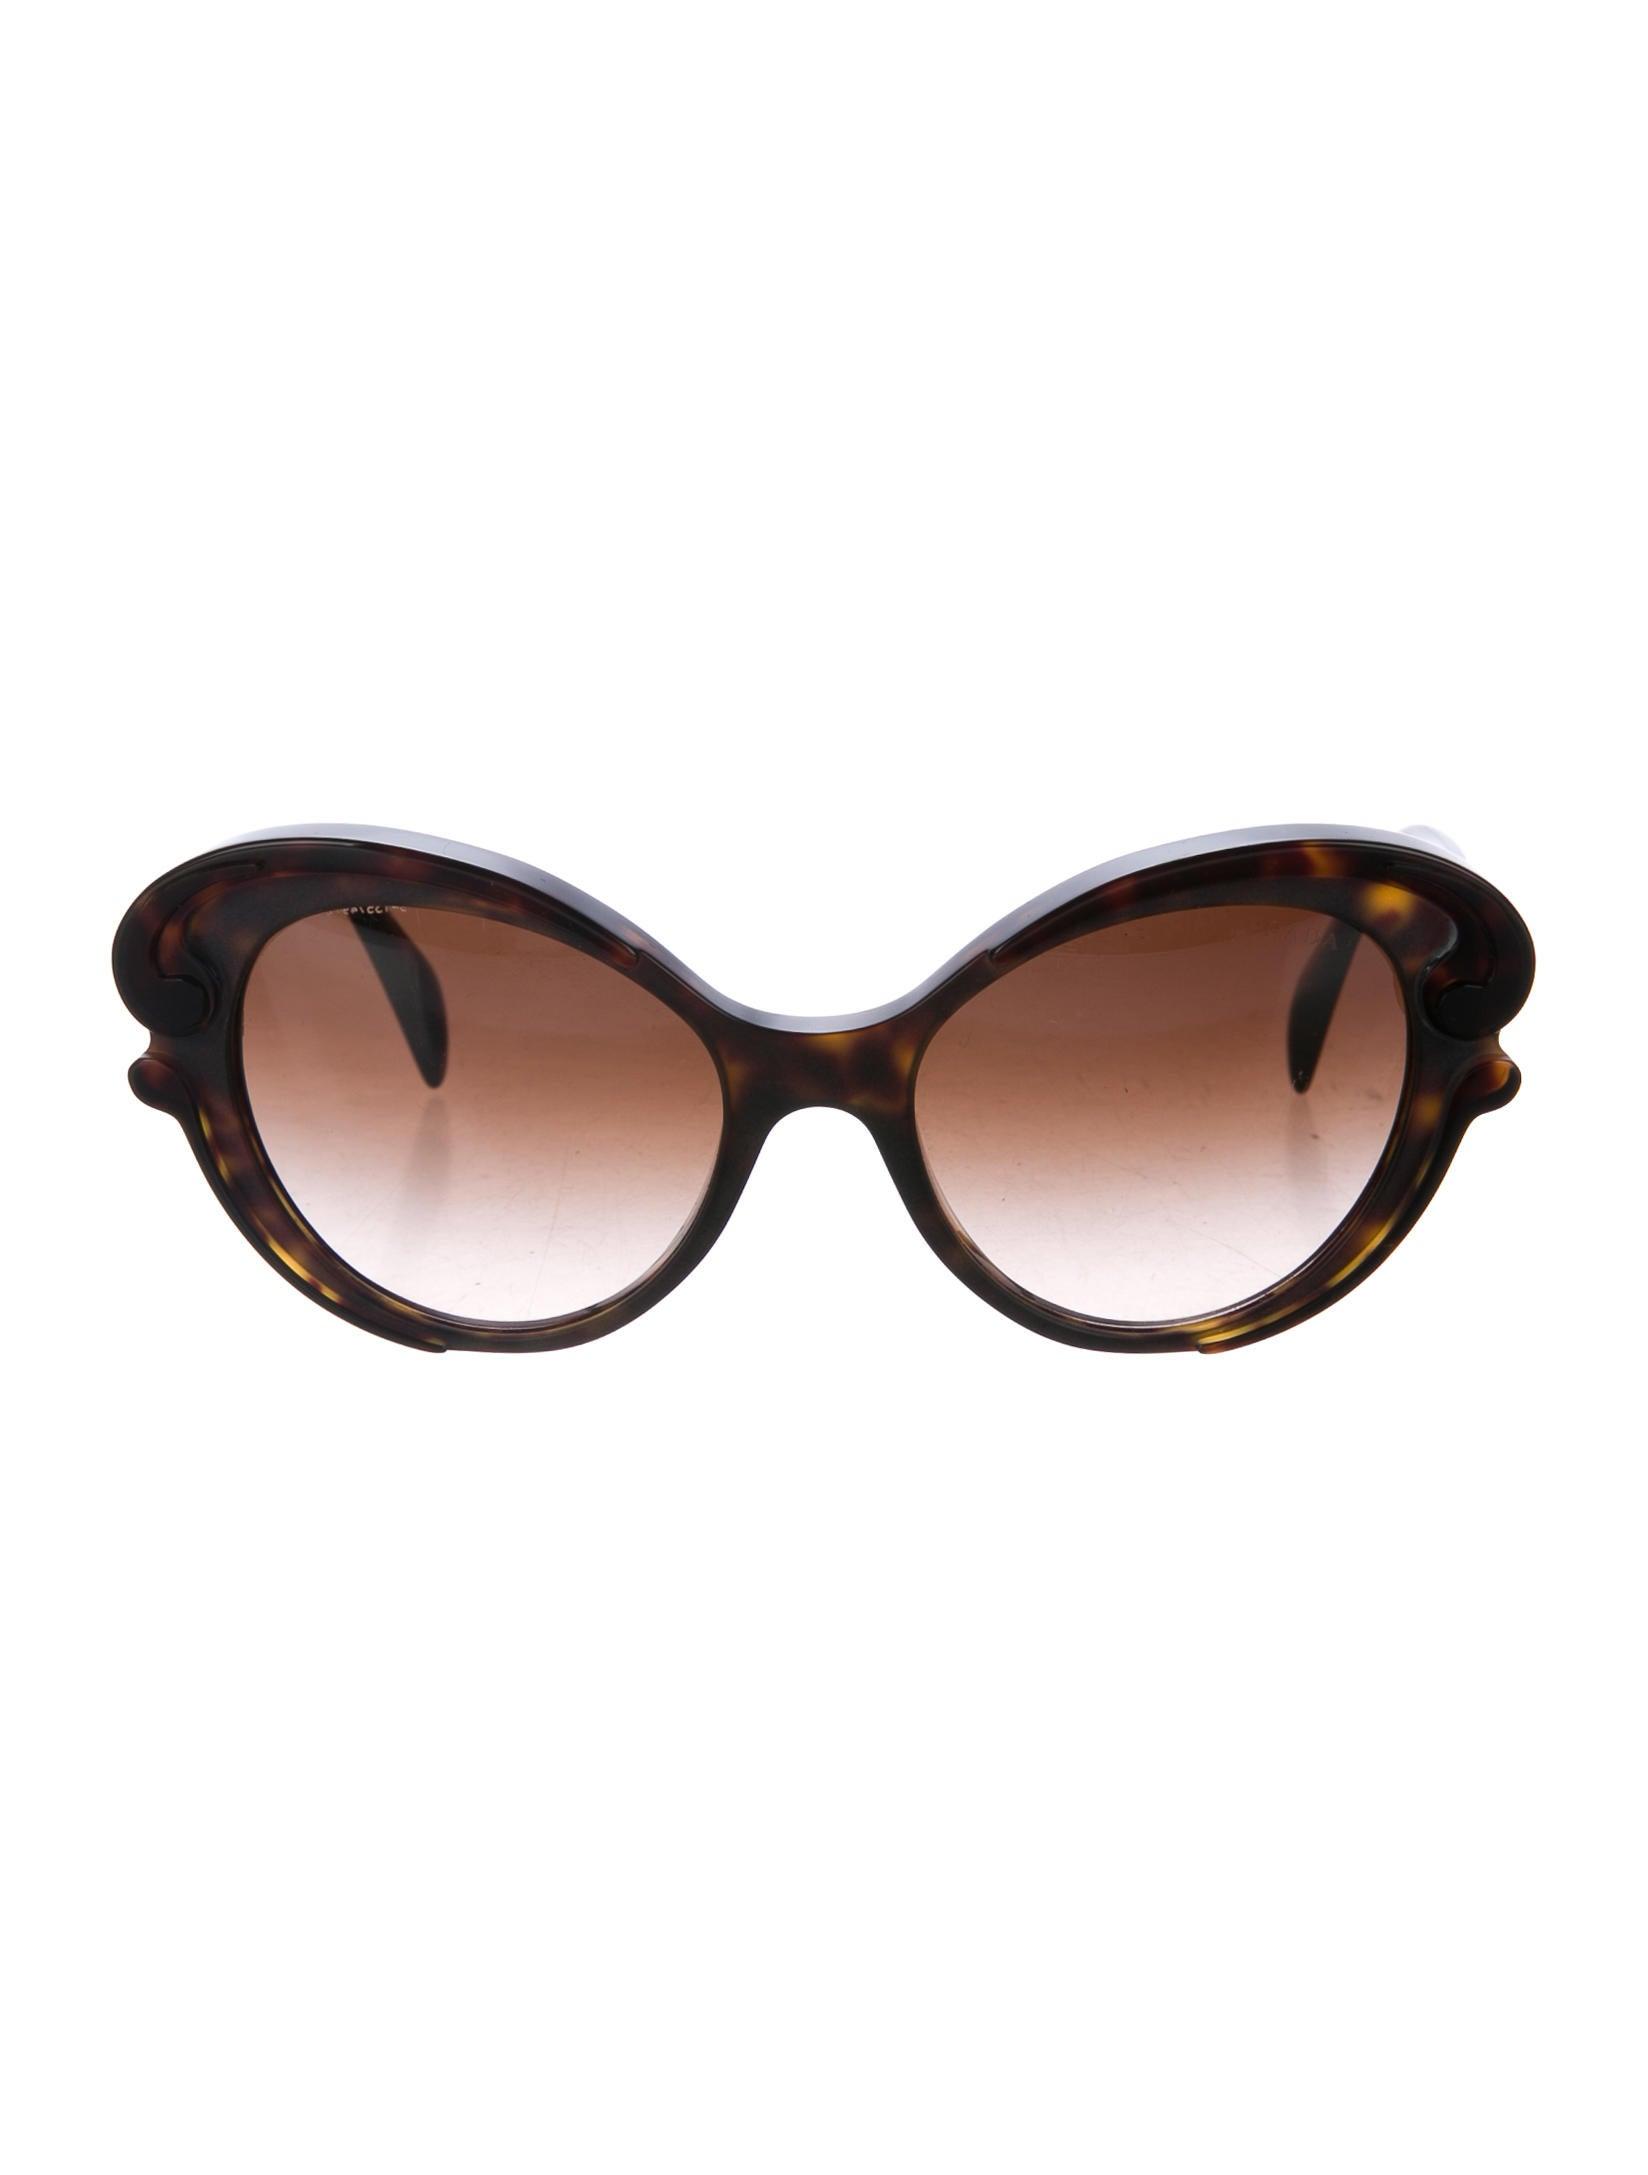 b4958165b4 Prada Baroque Round Sunglasses - Accessories - PRA161866